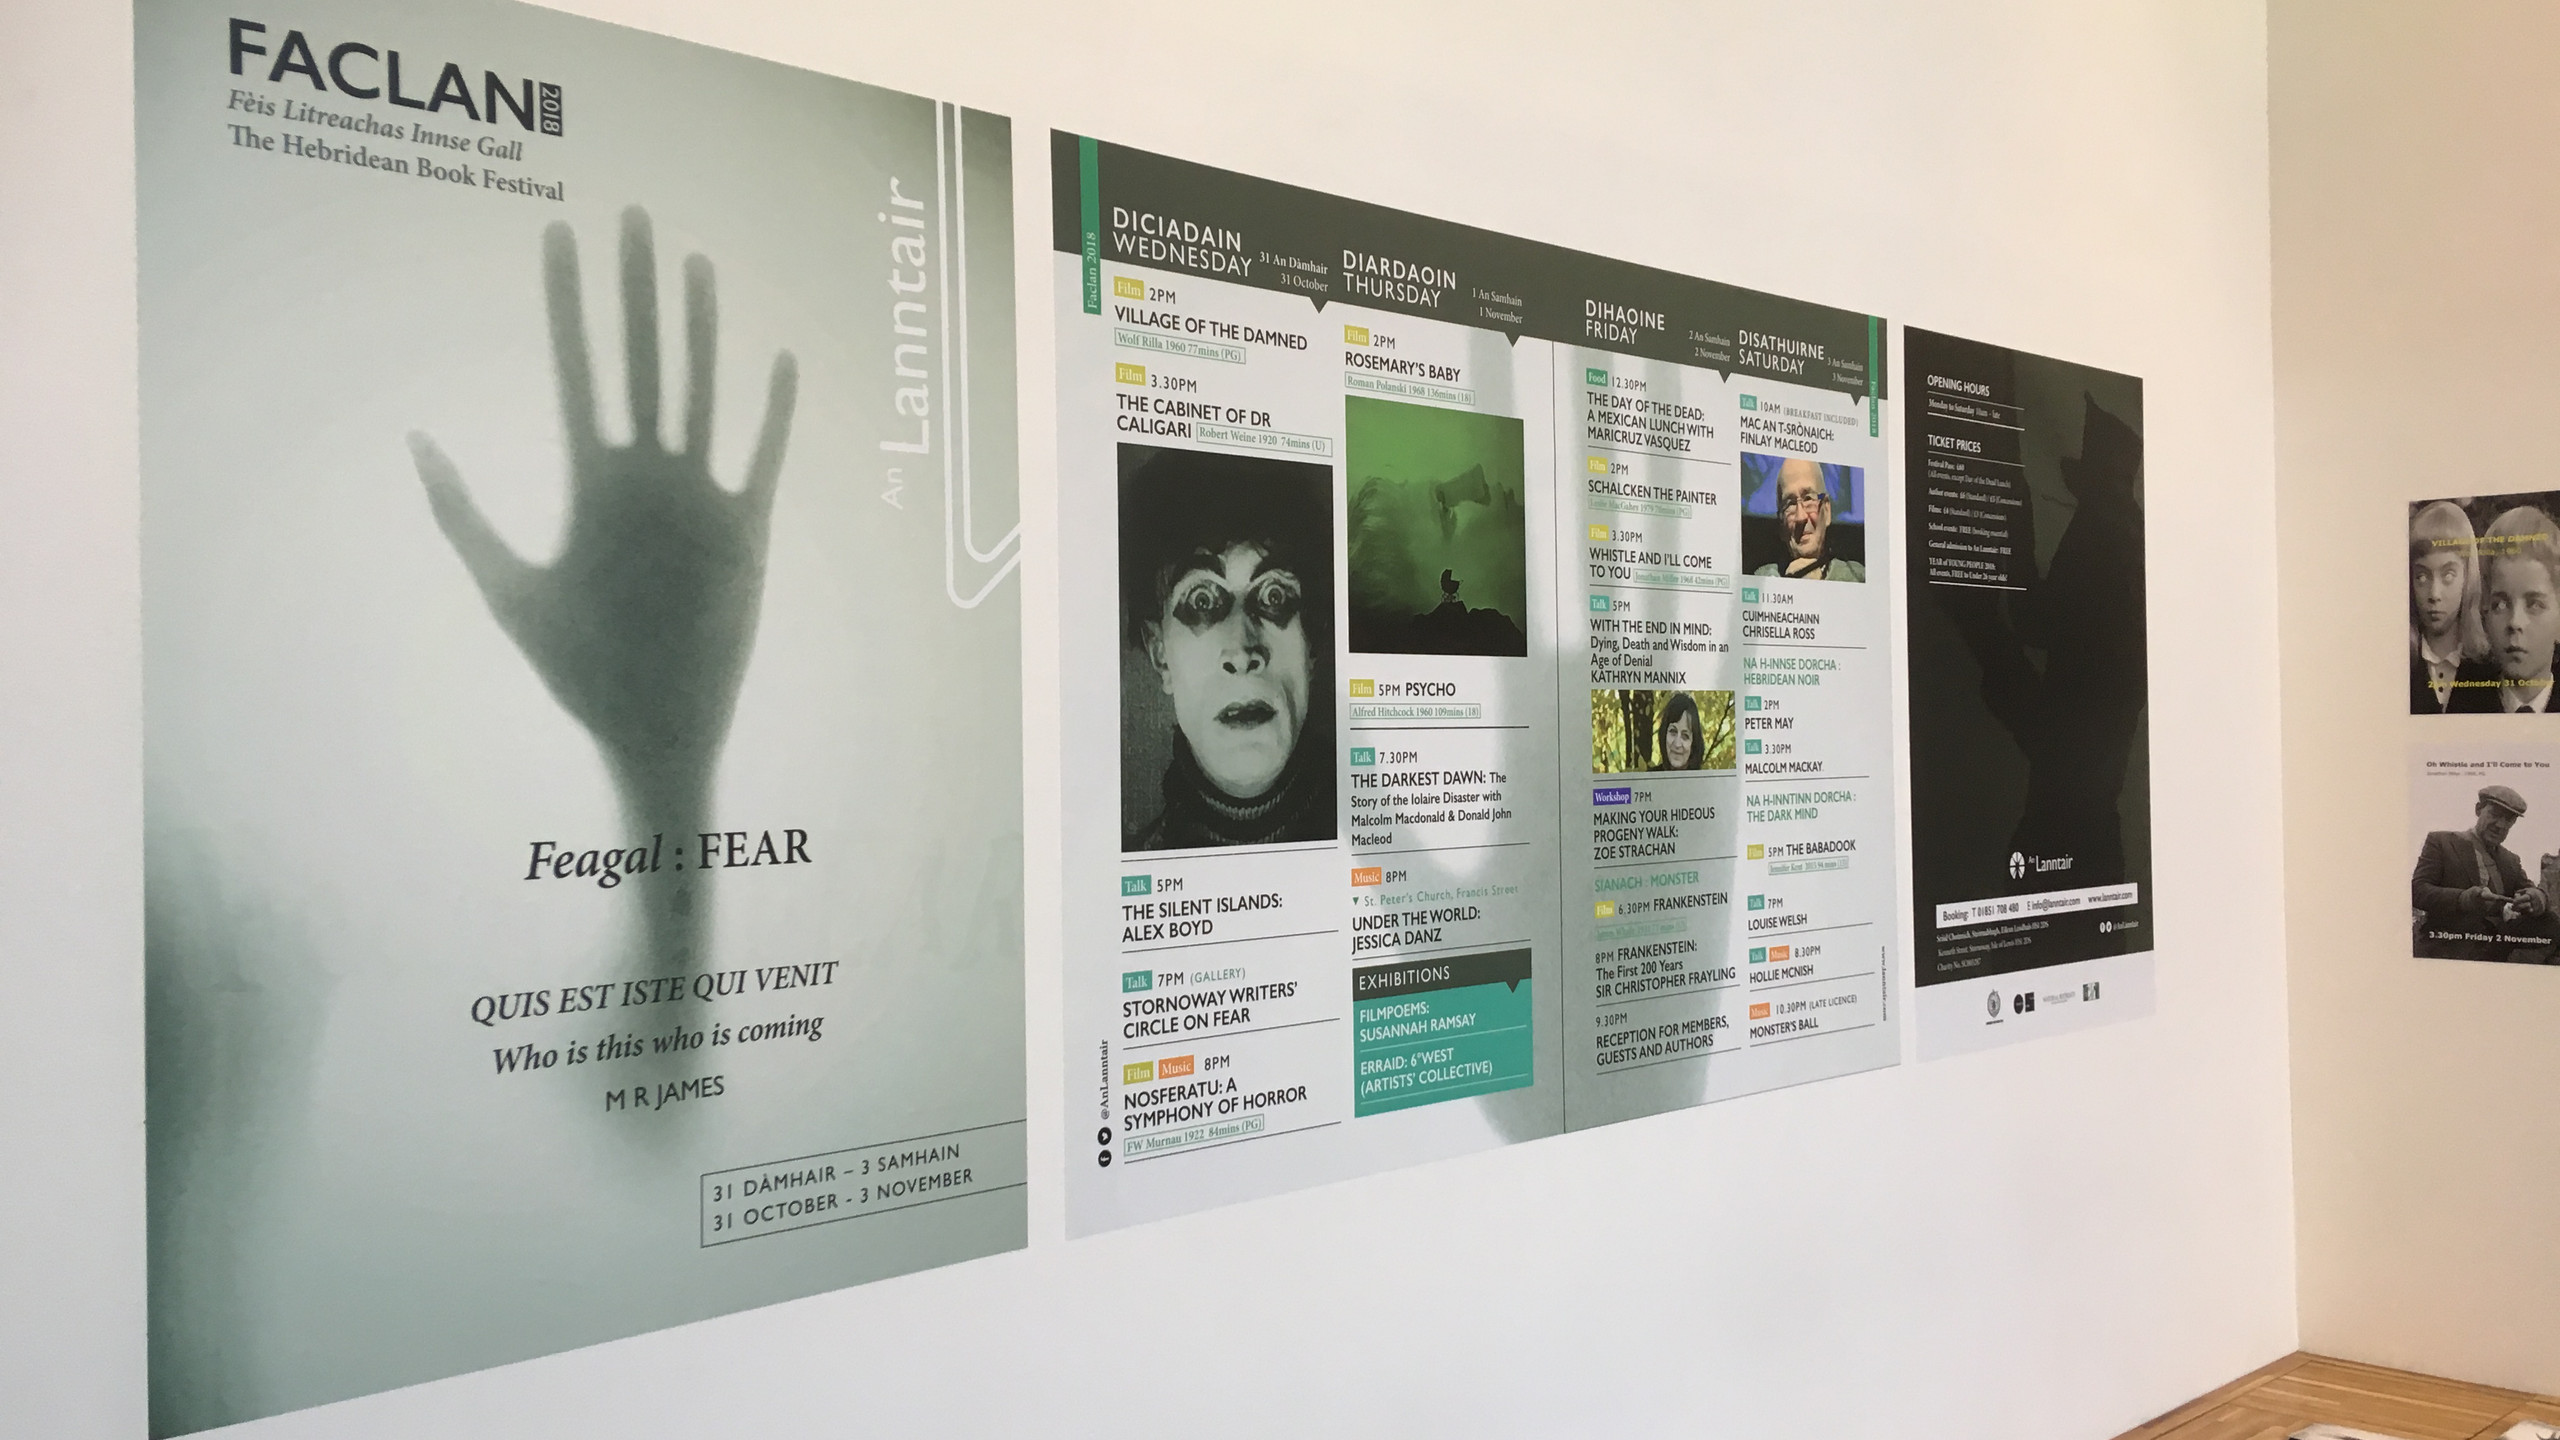 Fanclan posters.